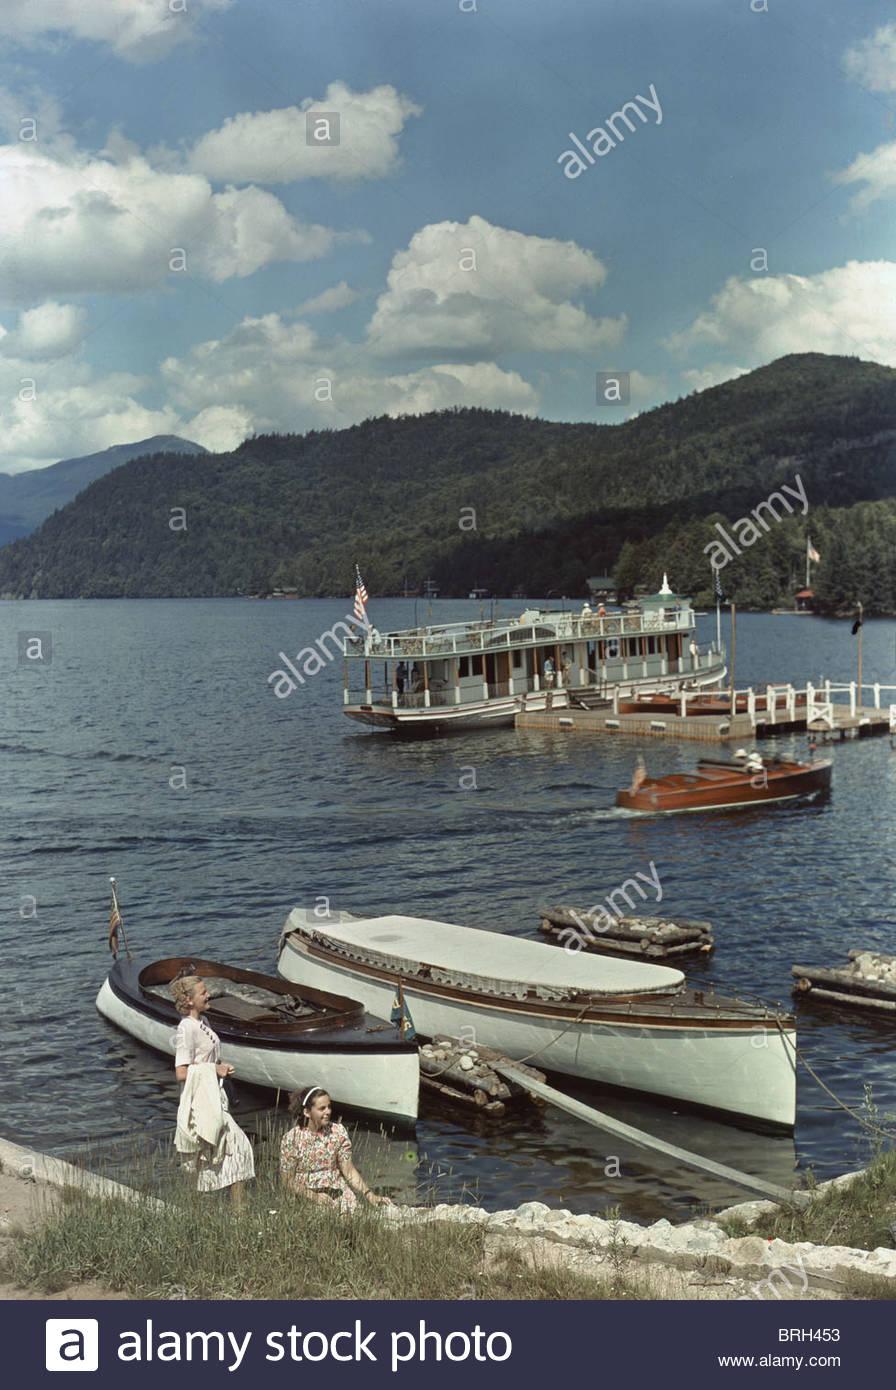 Visitors come to Lake Placid year-round to swim, ski, or skate. - Stock Image